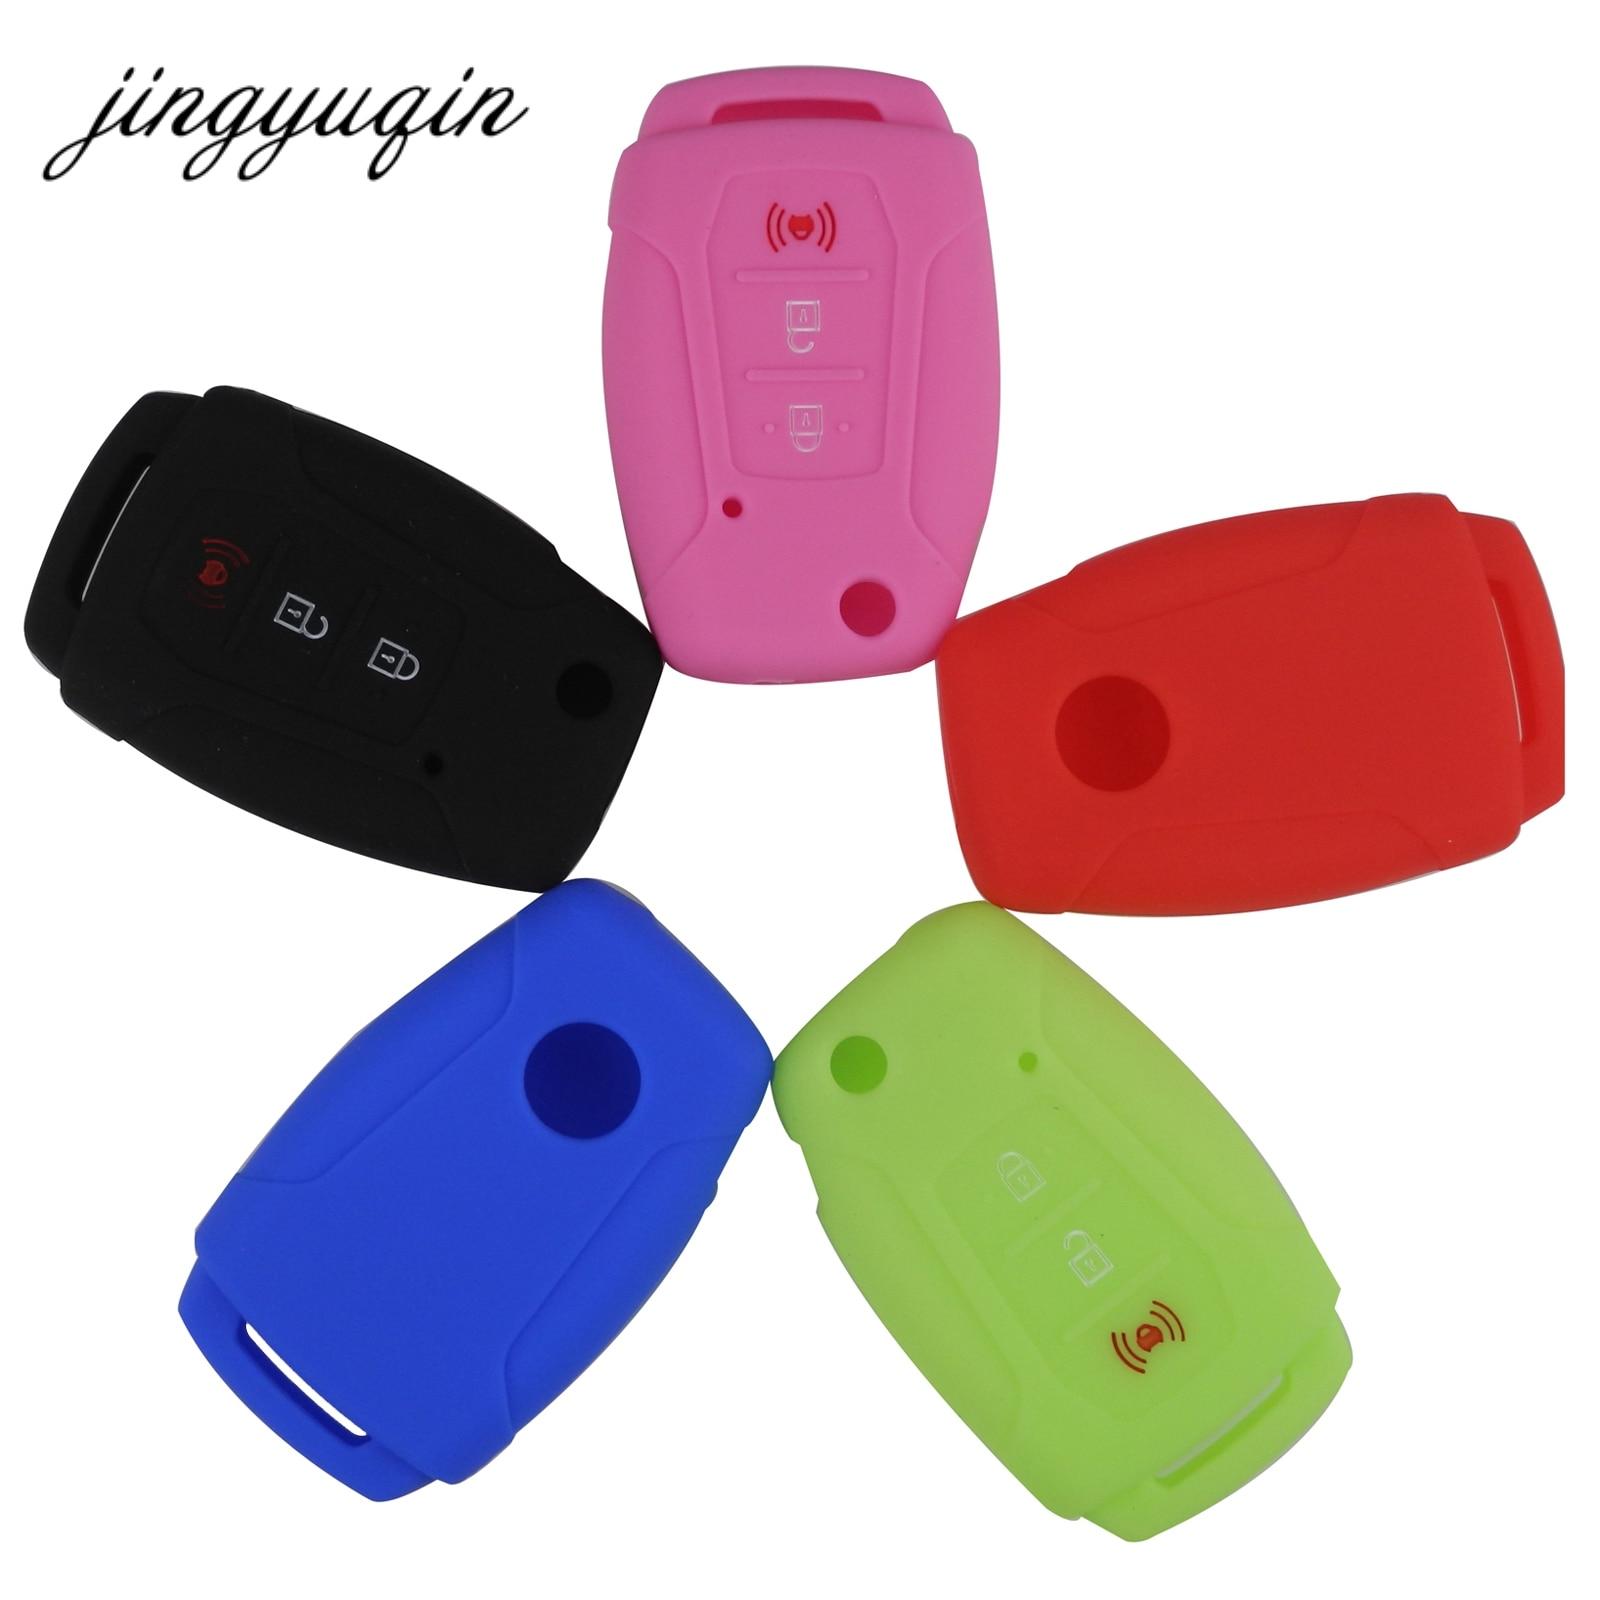 jingyuqin Silicone Key FOB Holder Protector For Ssangyong Rexton Korando C Tivoli Flip Folding Remote Cover Silica Gel Case(China)